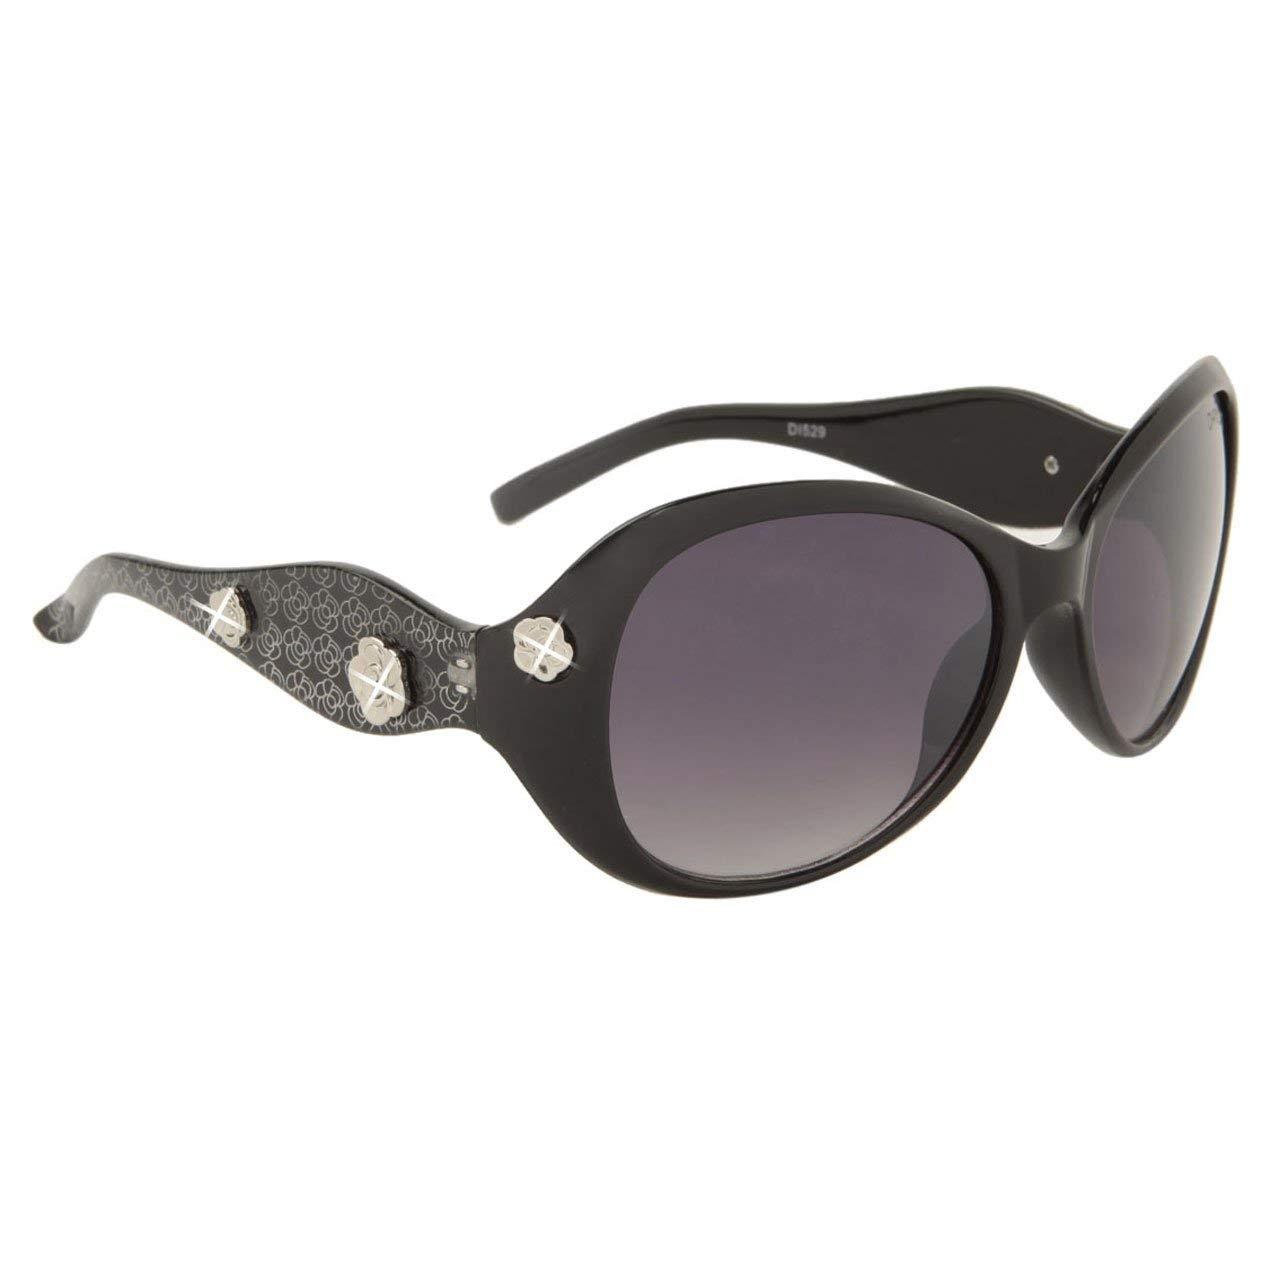 dba911db75cc Get Quotations · FancyG® Women s Fashion Sunglasses Diamond Eye Style  Flower Look UV Protection Eyewear - Black